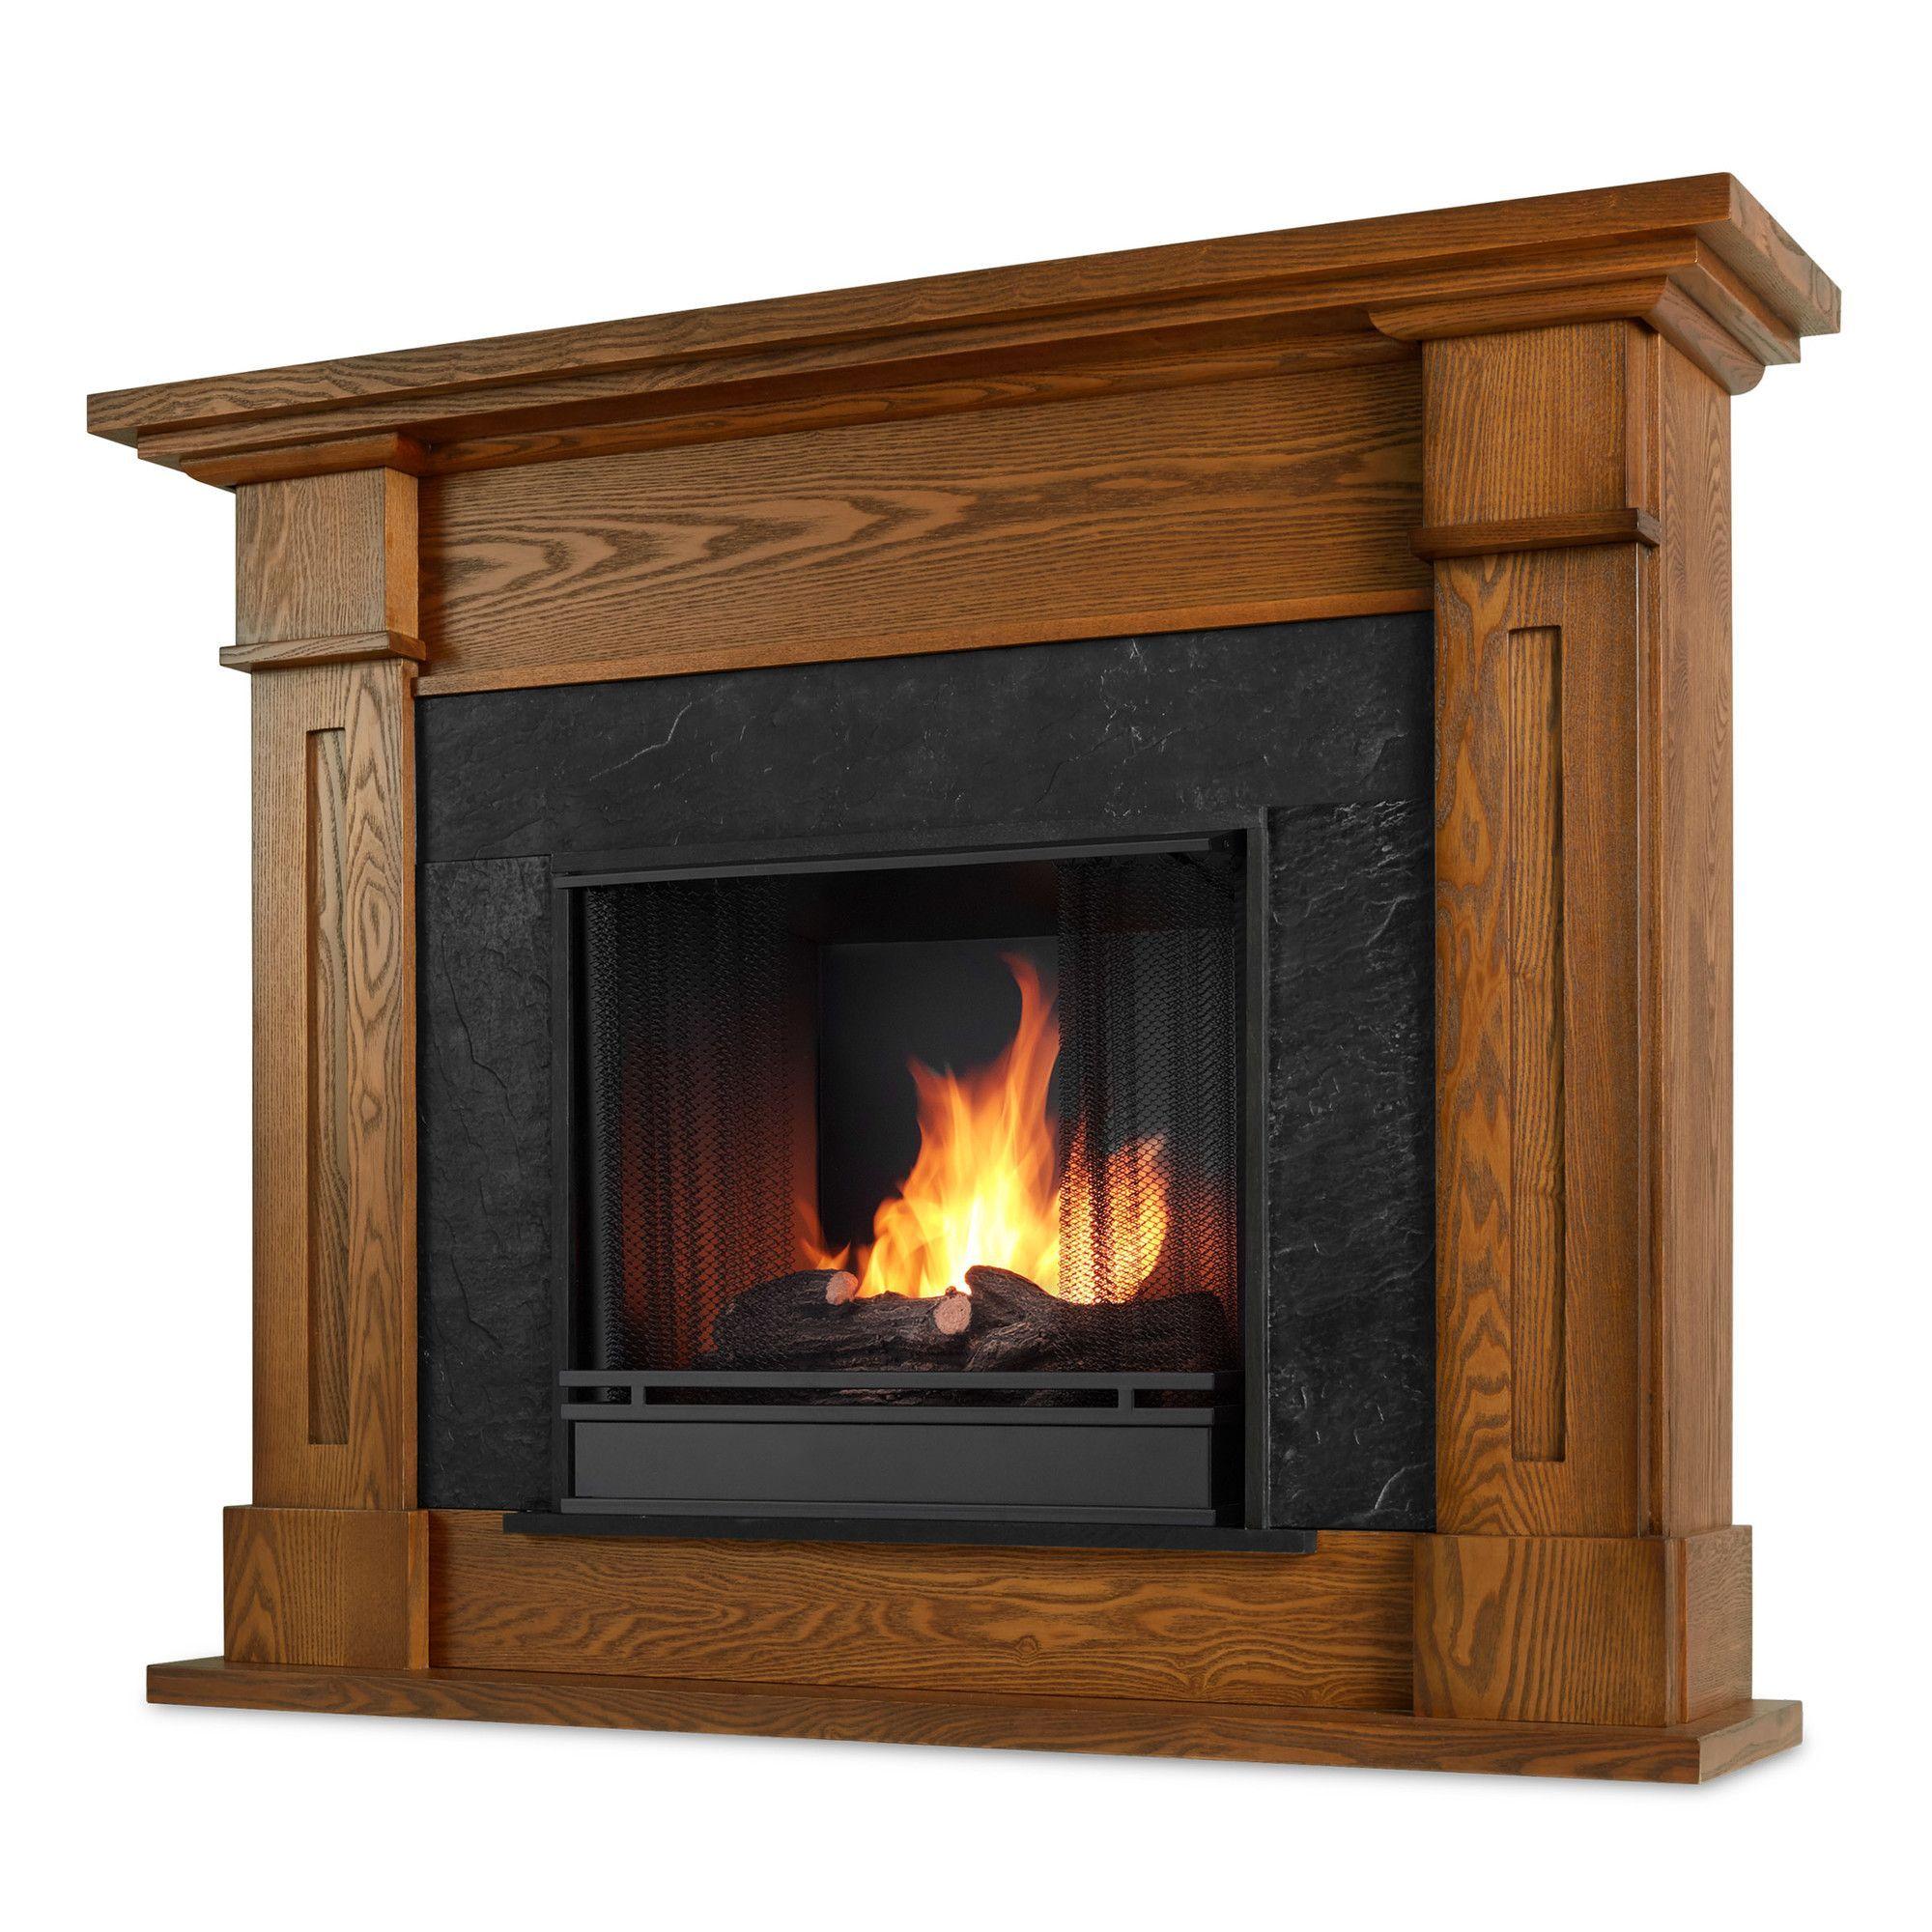 features kipling collection includes mantel firebox hand rh pinterest com